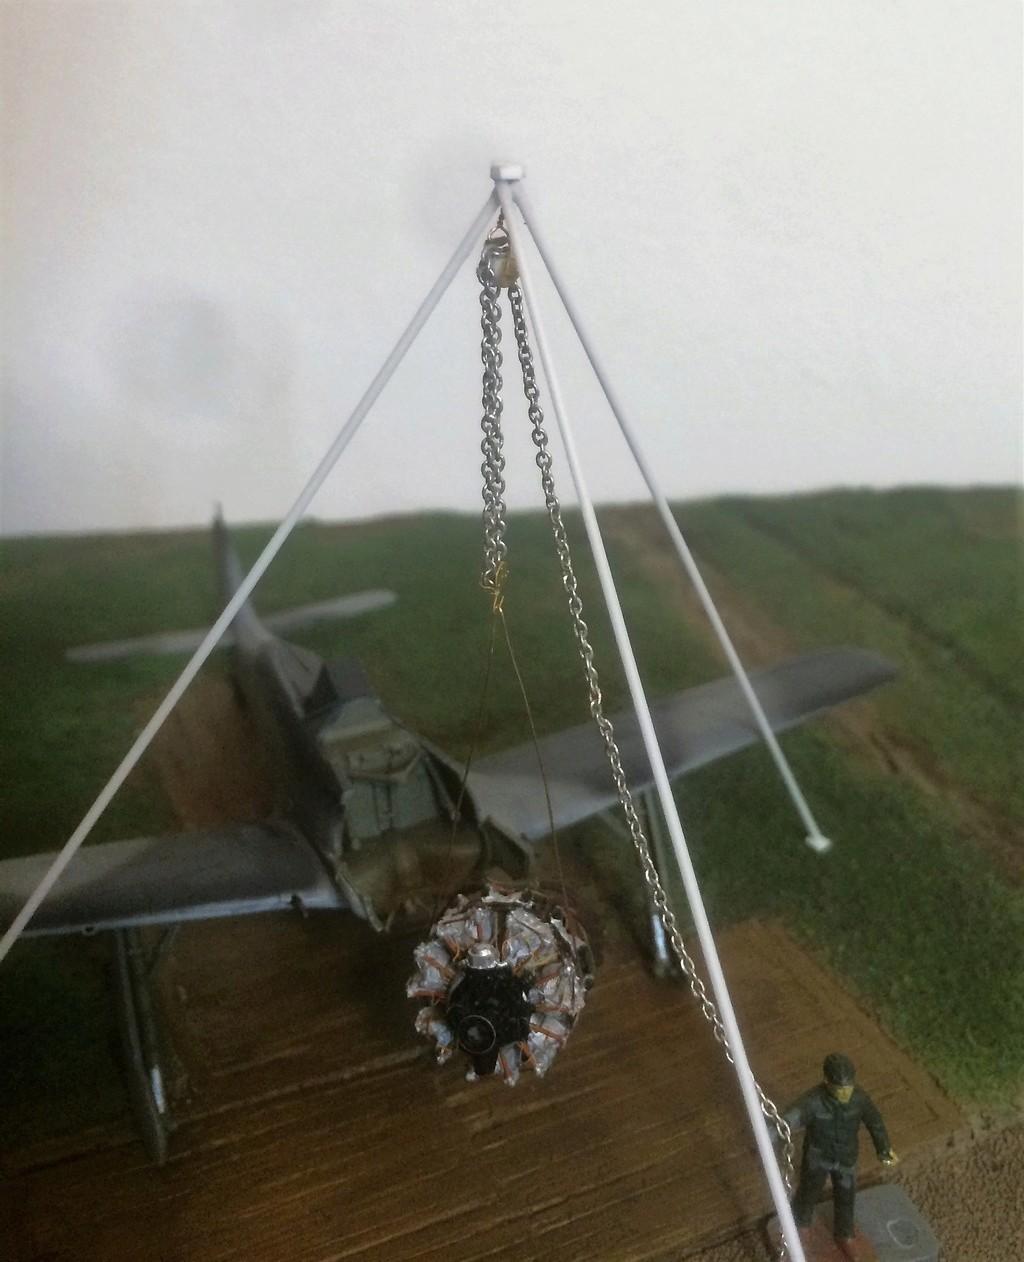 FW 190A8 - EDUARD ROYAL CLASS + Brassin -1/72 + projet diorama (Trois avions terminés) - Page 5 Img_7636